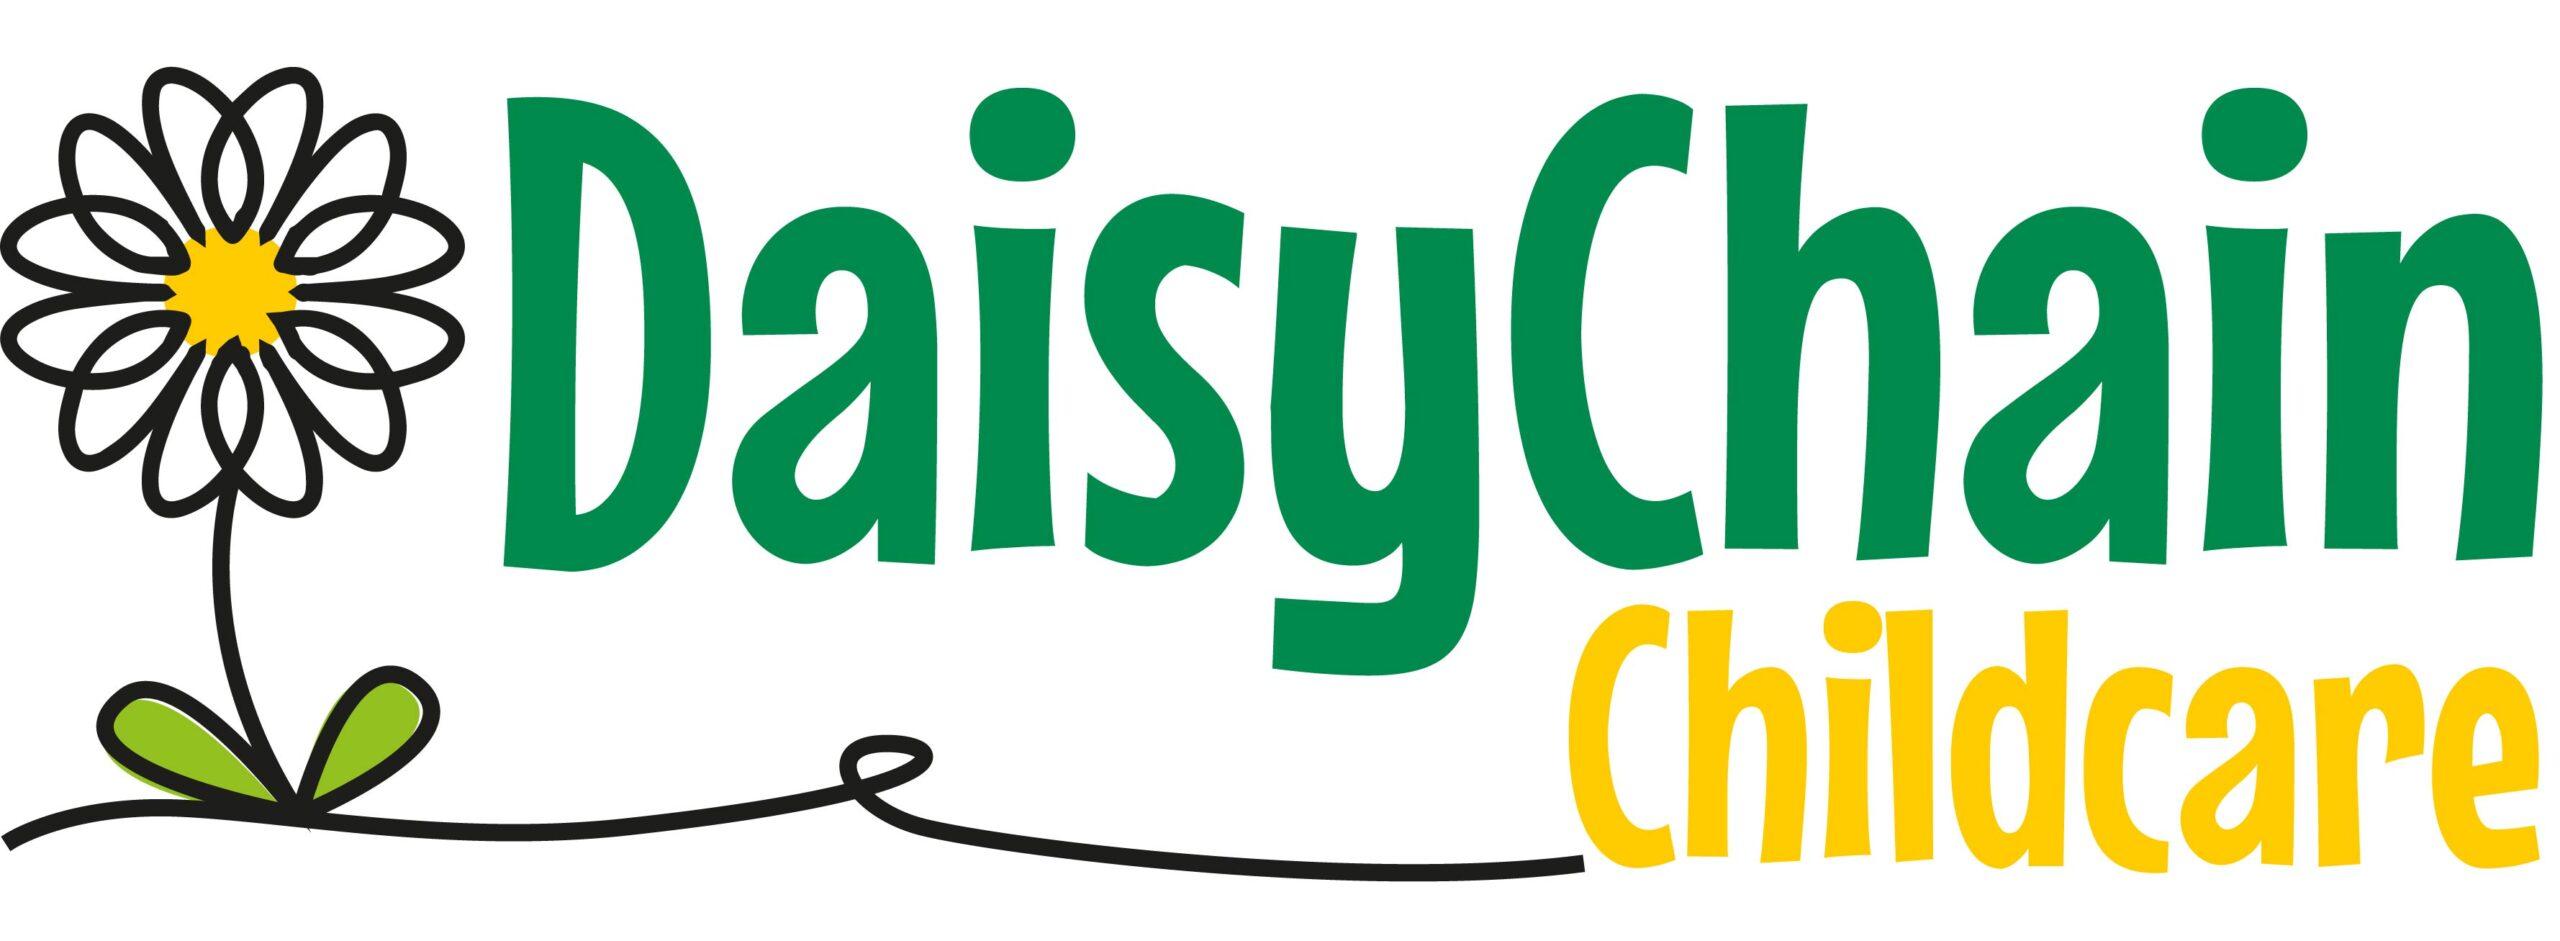 DaisyChain Childcare Logo